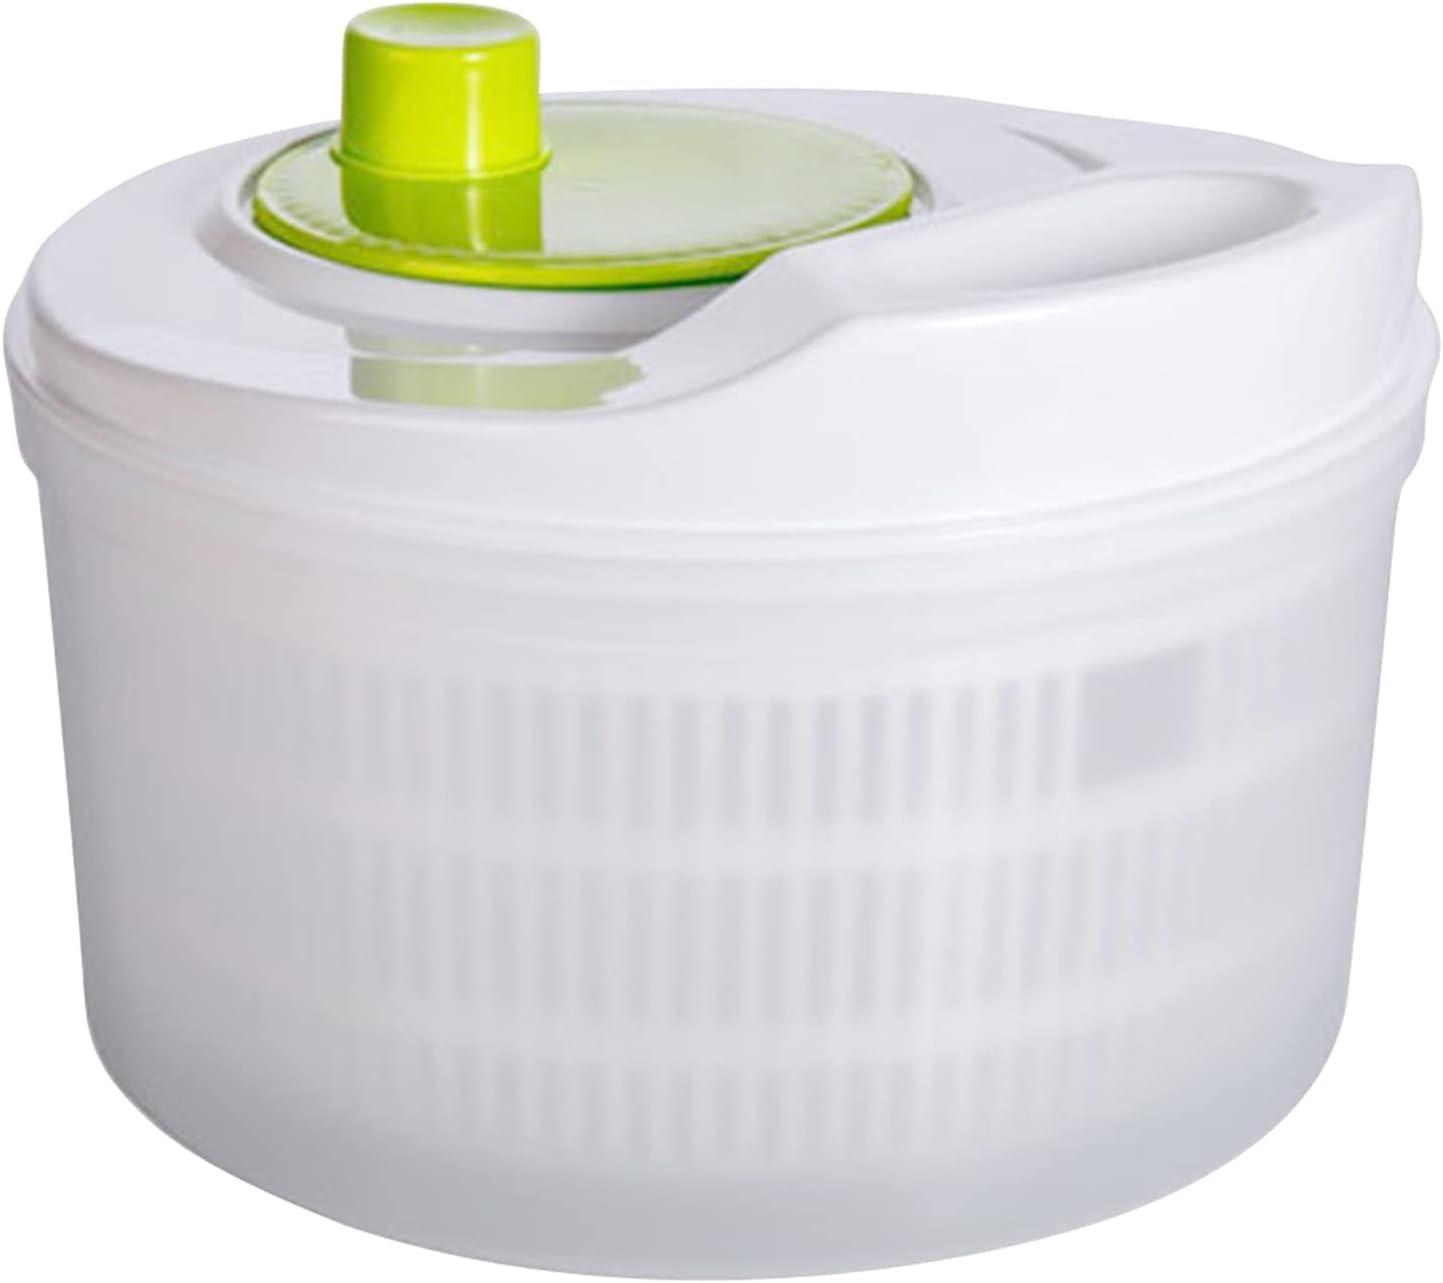 Salad Spinner Creative Vegetable Large-scale sale Multifuncti Price reduction Fruit Drainer Dryer